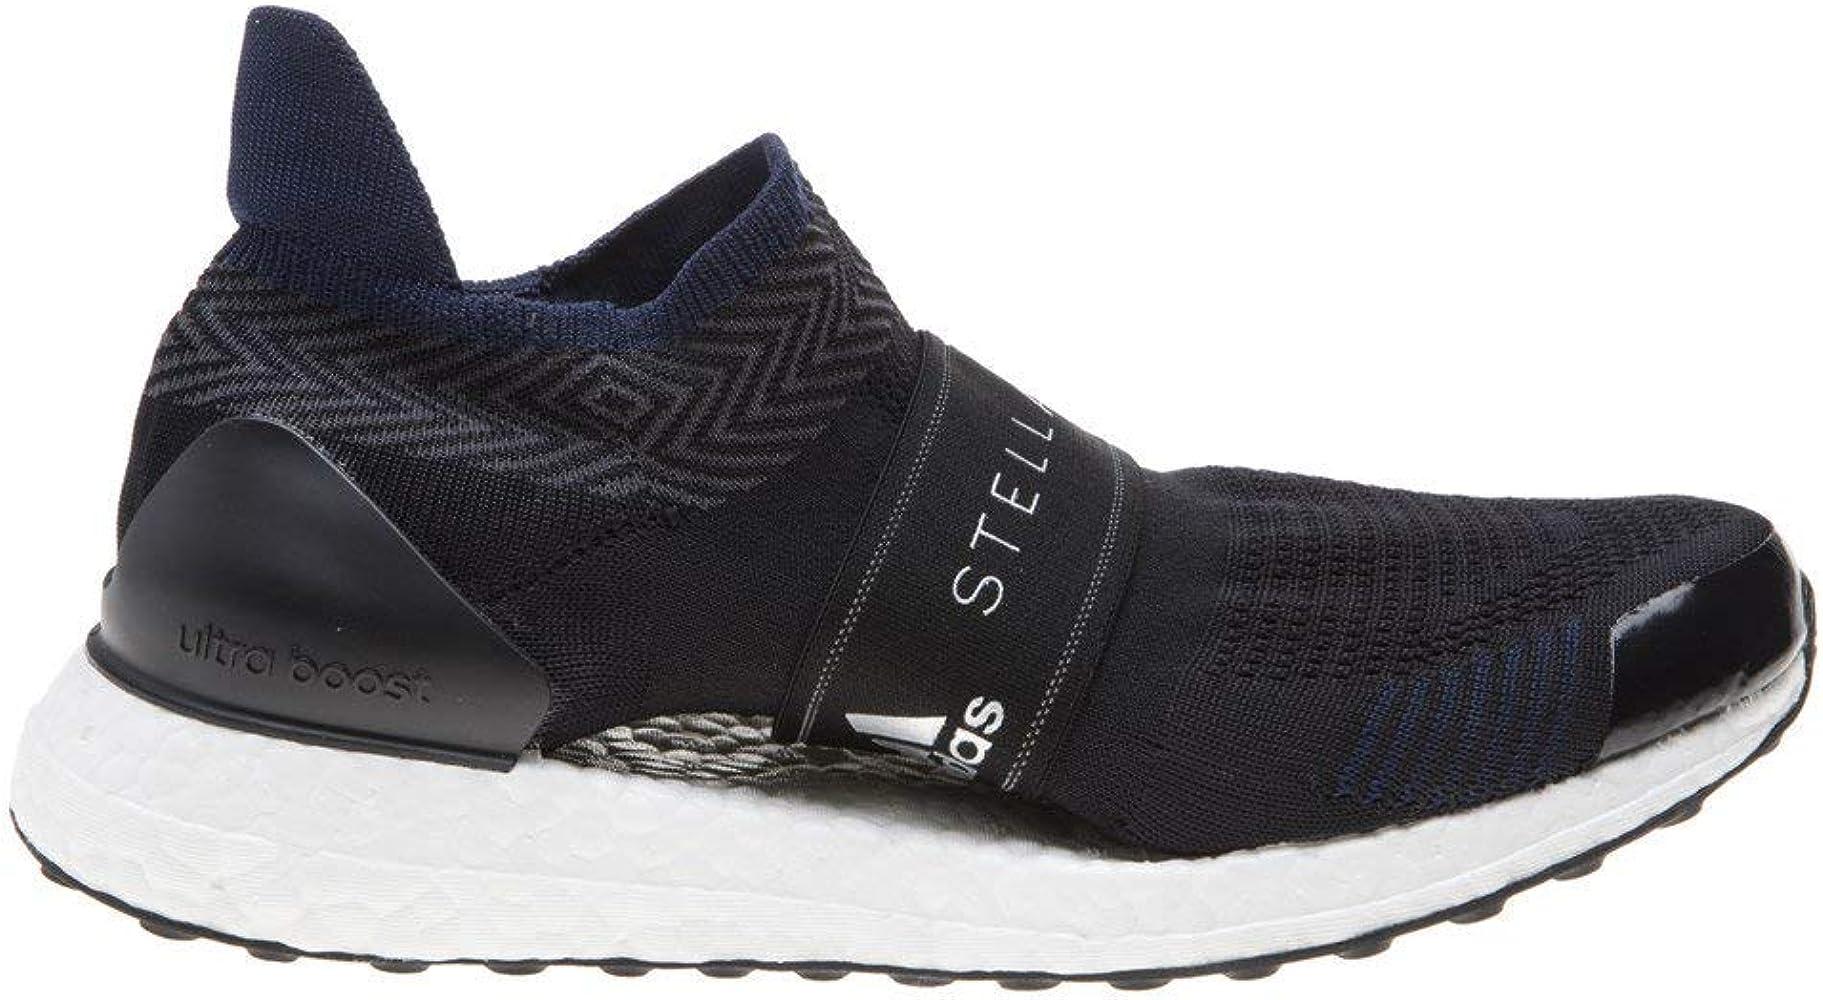 236c4c4b734f2 Amazon.com: Stella Mccartney Ultraboost X 3.D Womens Sneakers Black ...